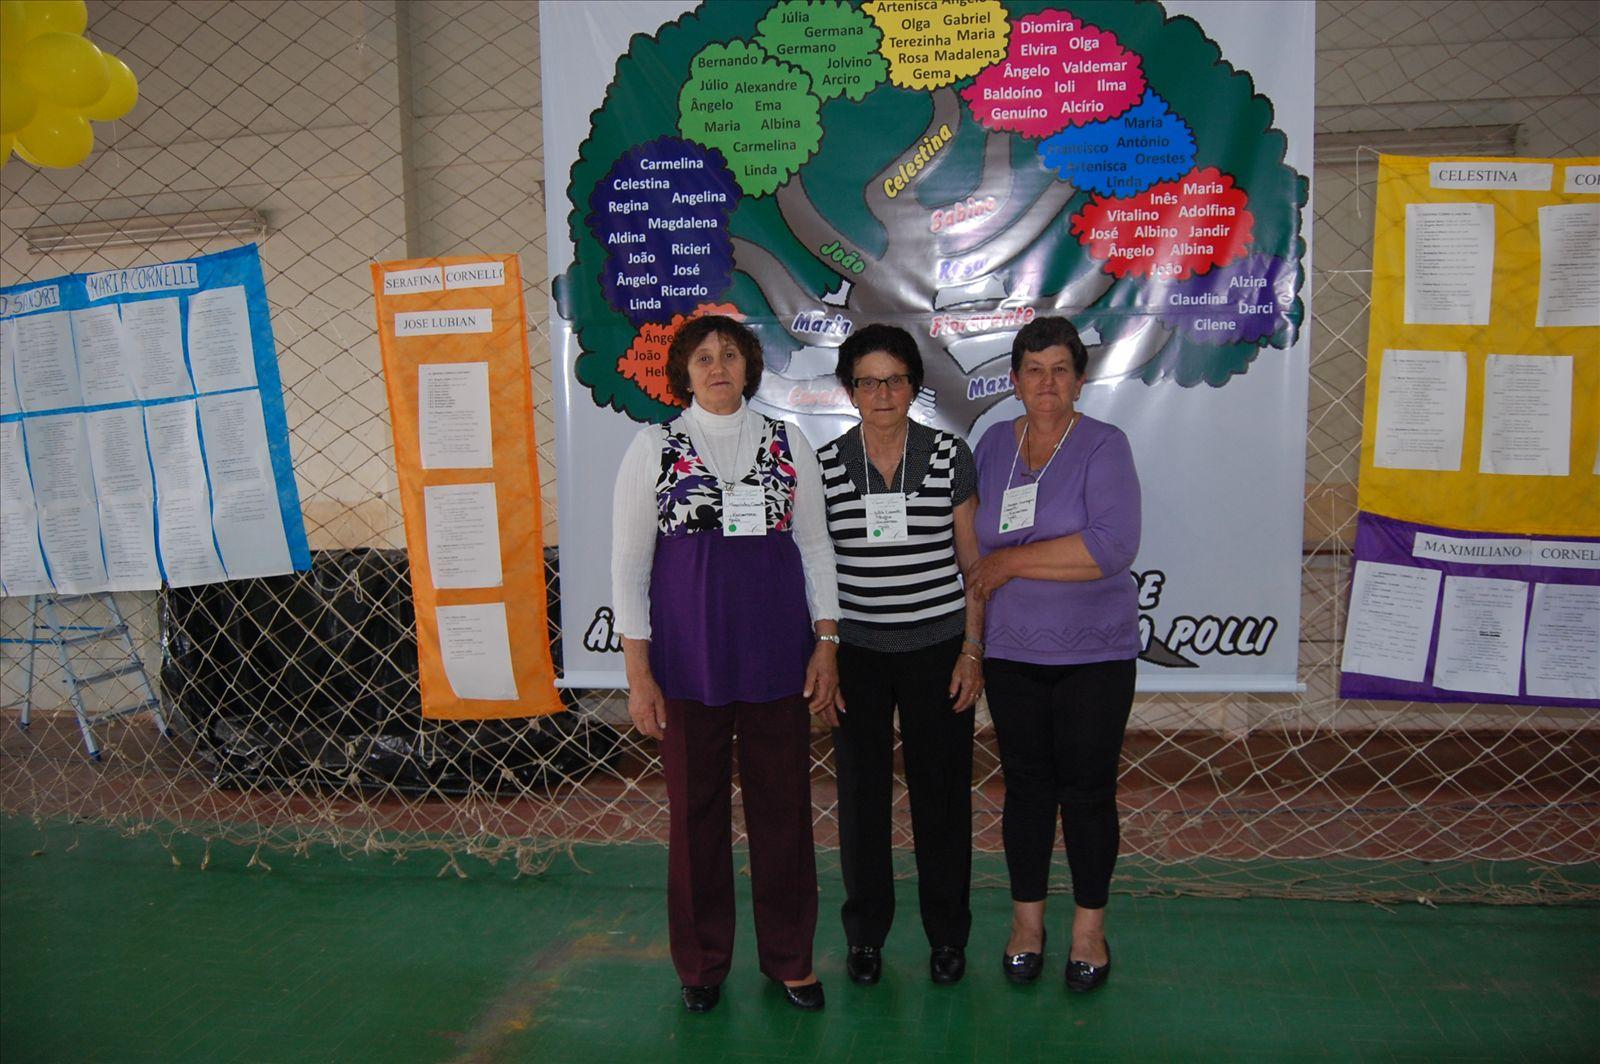 2º Encontro Família Cornelli - 11.10.2009 (205)_0